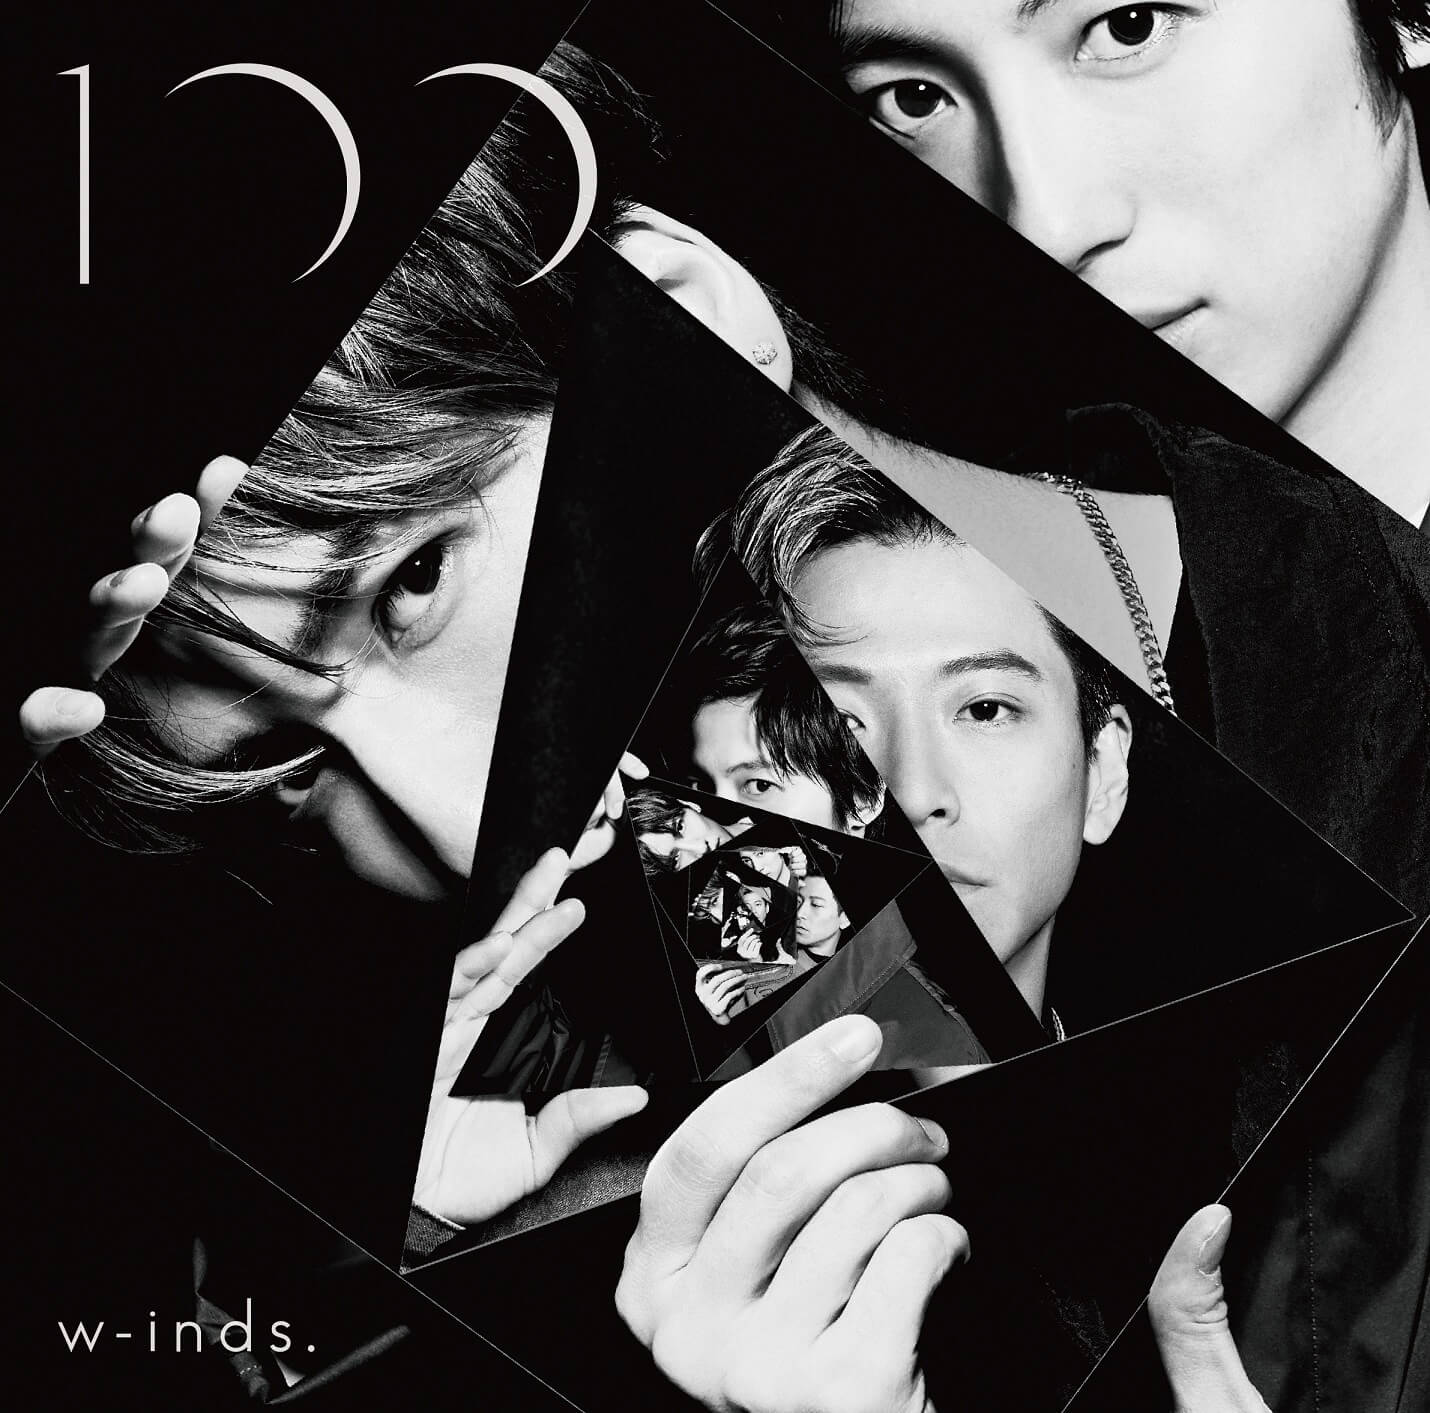 w-inds._100_CD__ジャケット